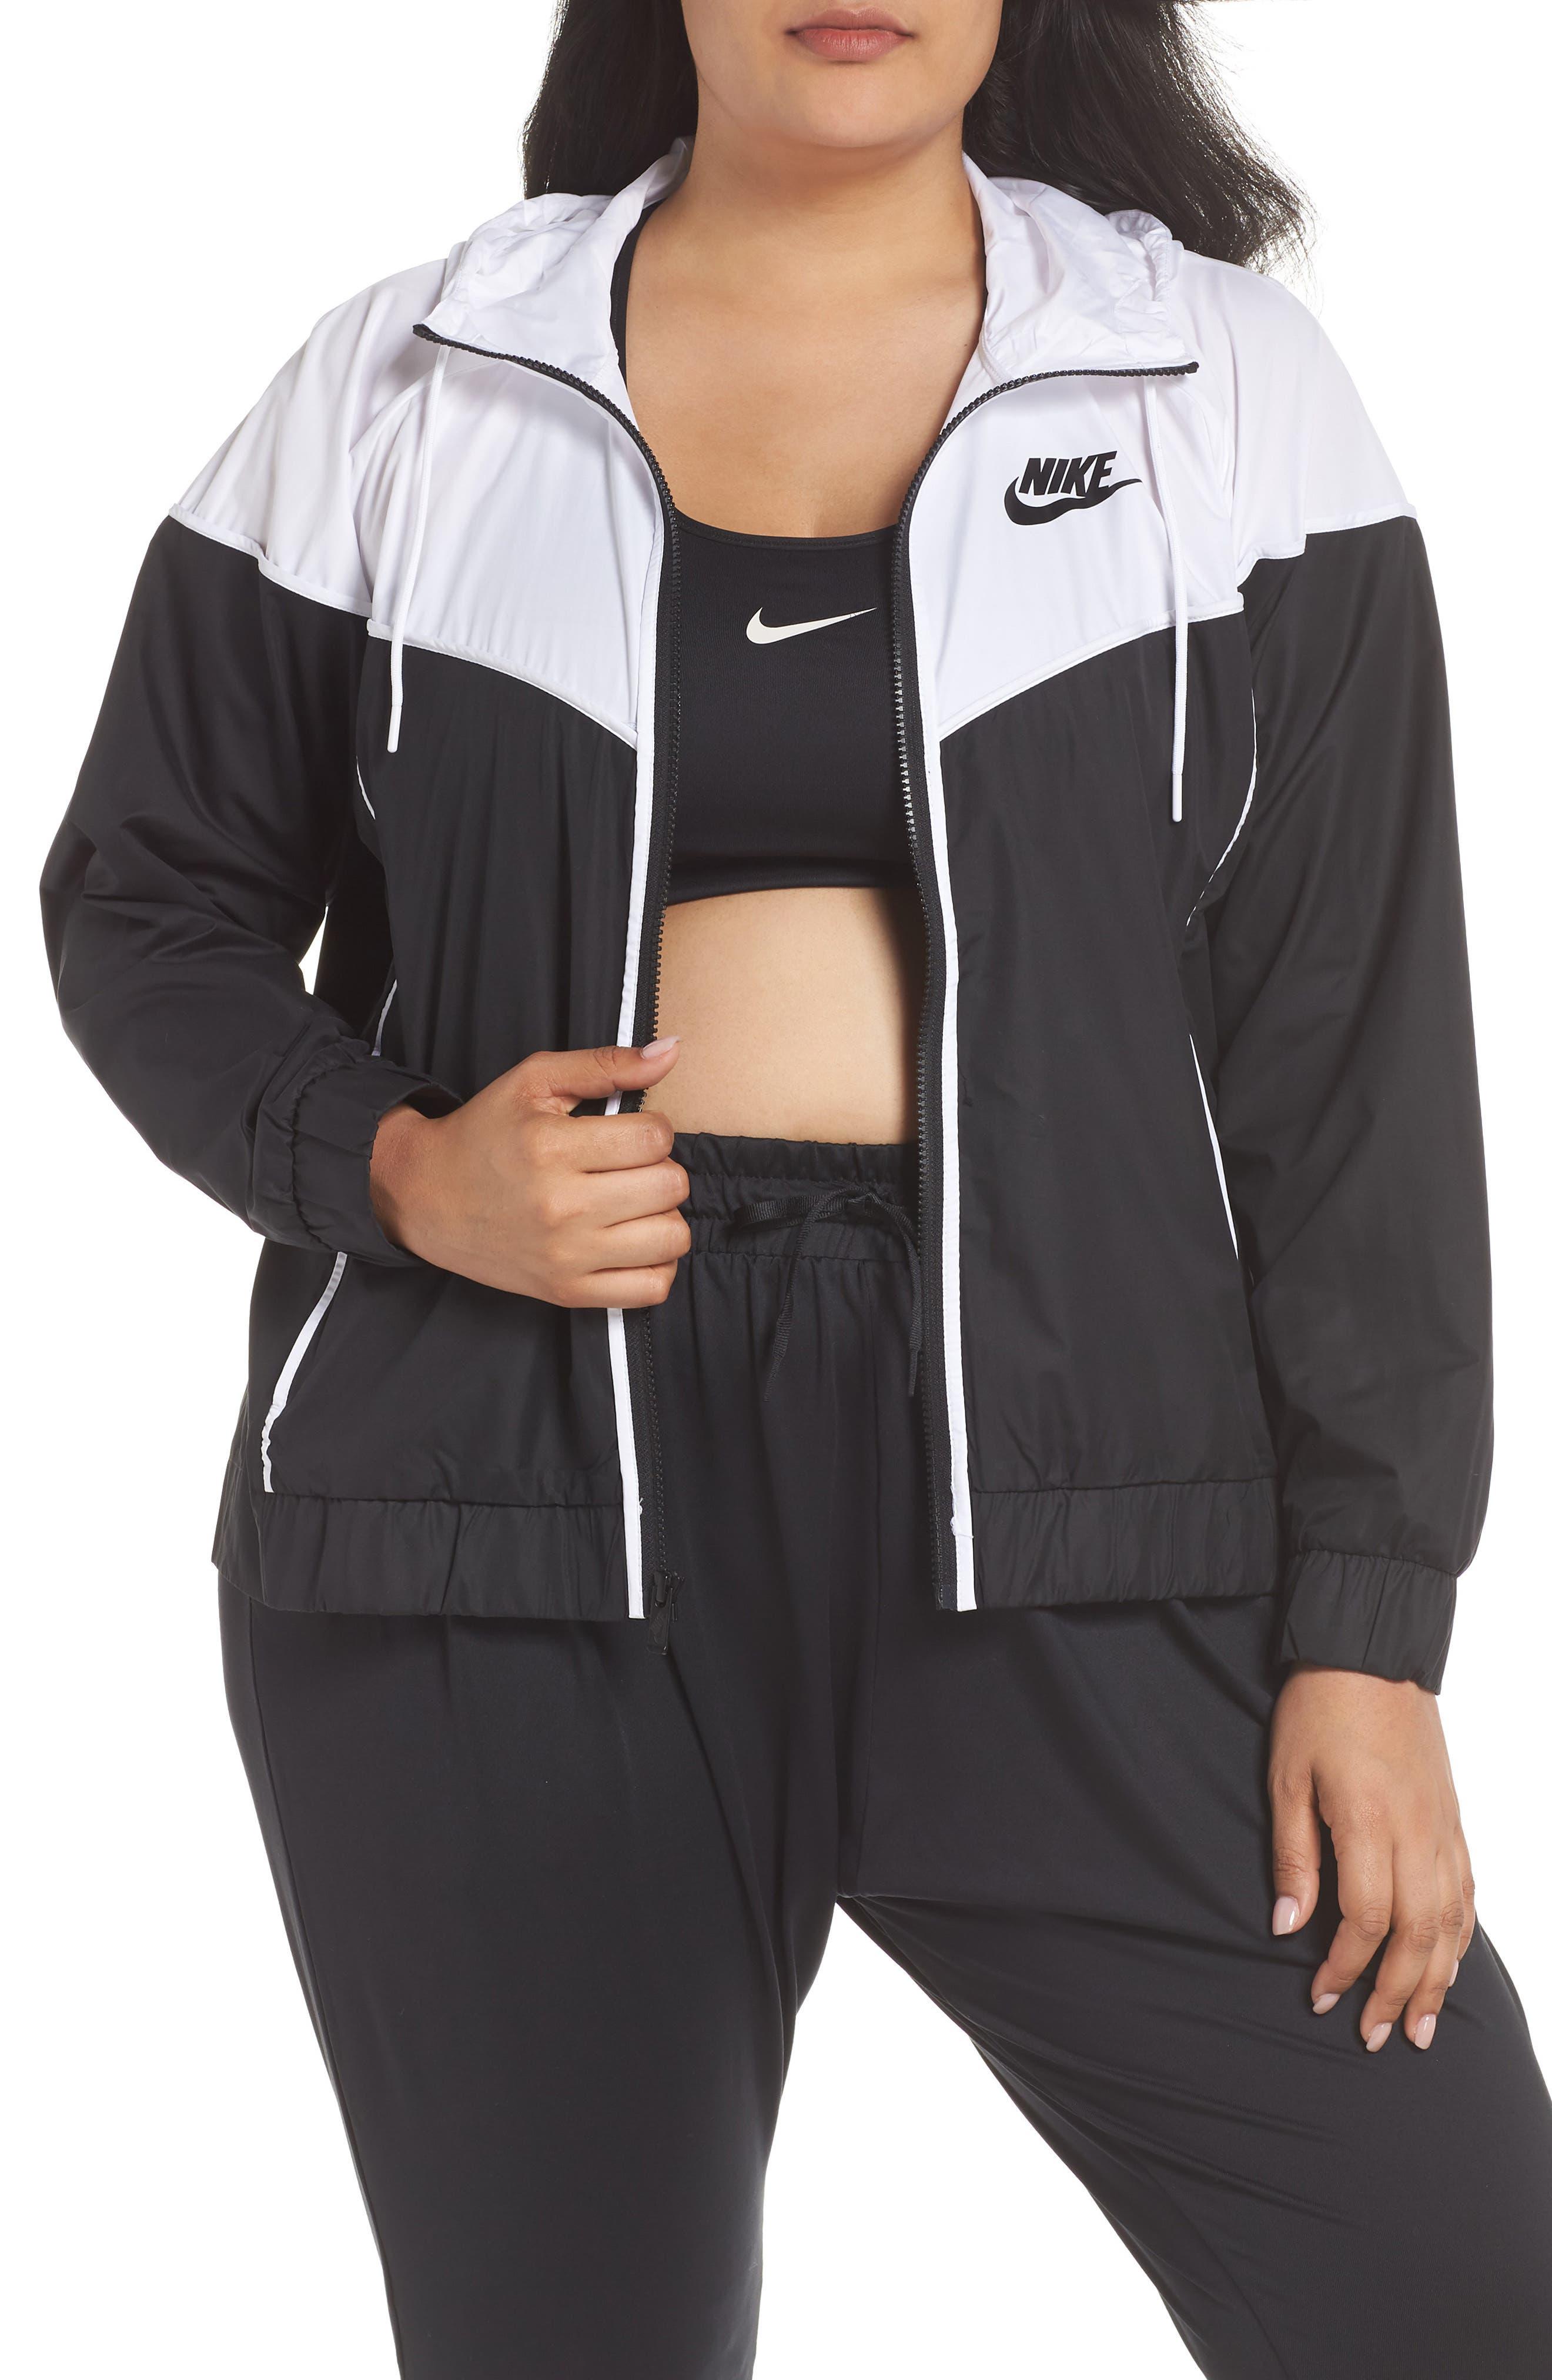 NIKE, Sportswear Windrunner Jacket, Main thumbnail 1, color, BLACK/ WHITE/ BLACK